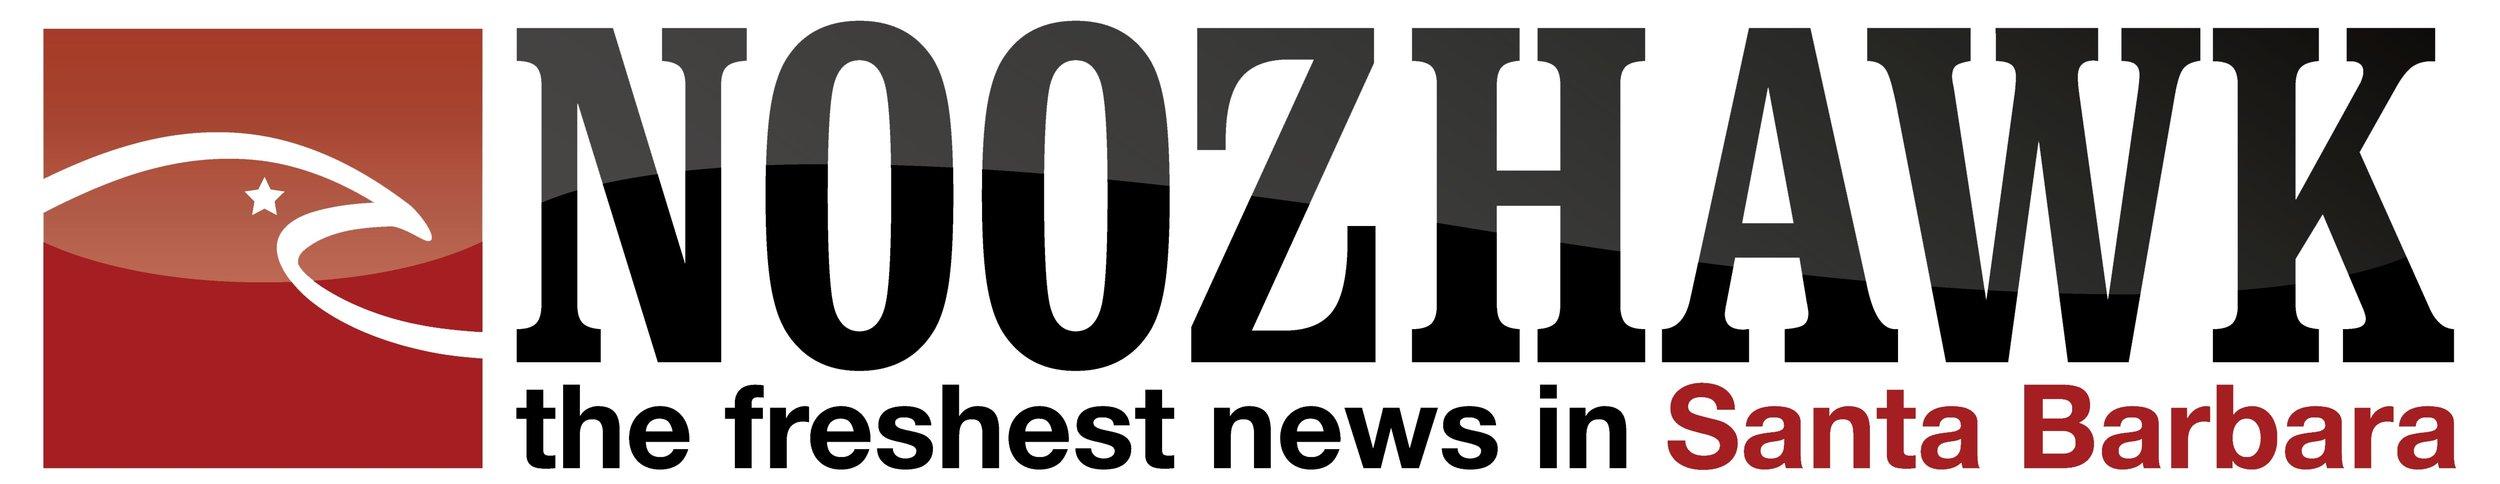 NOOZHAWK-transparent-logo for sponsors - Copy.jpg